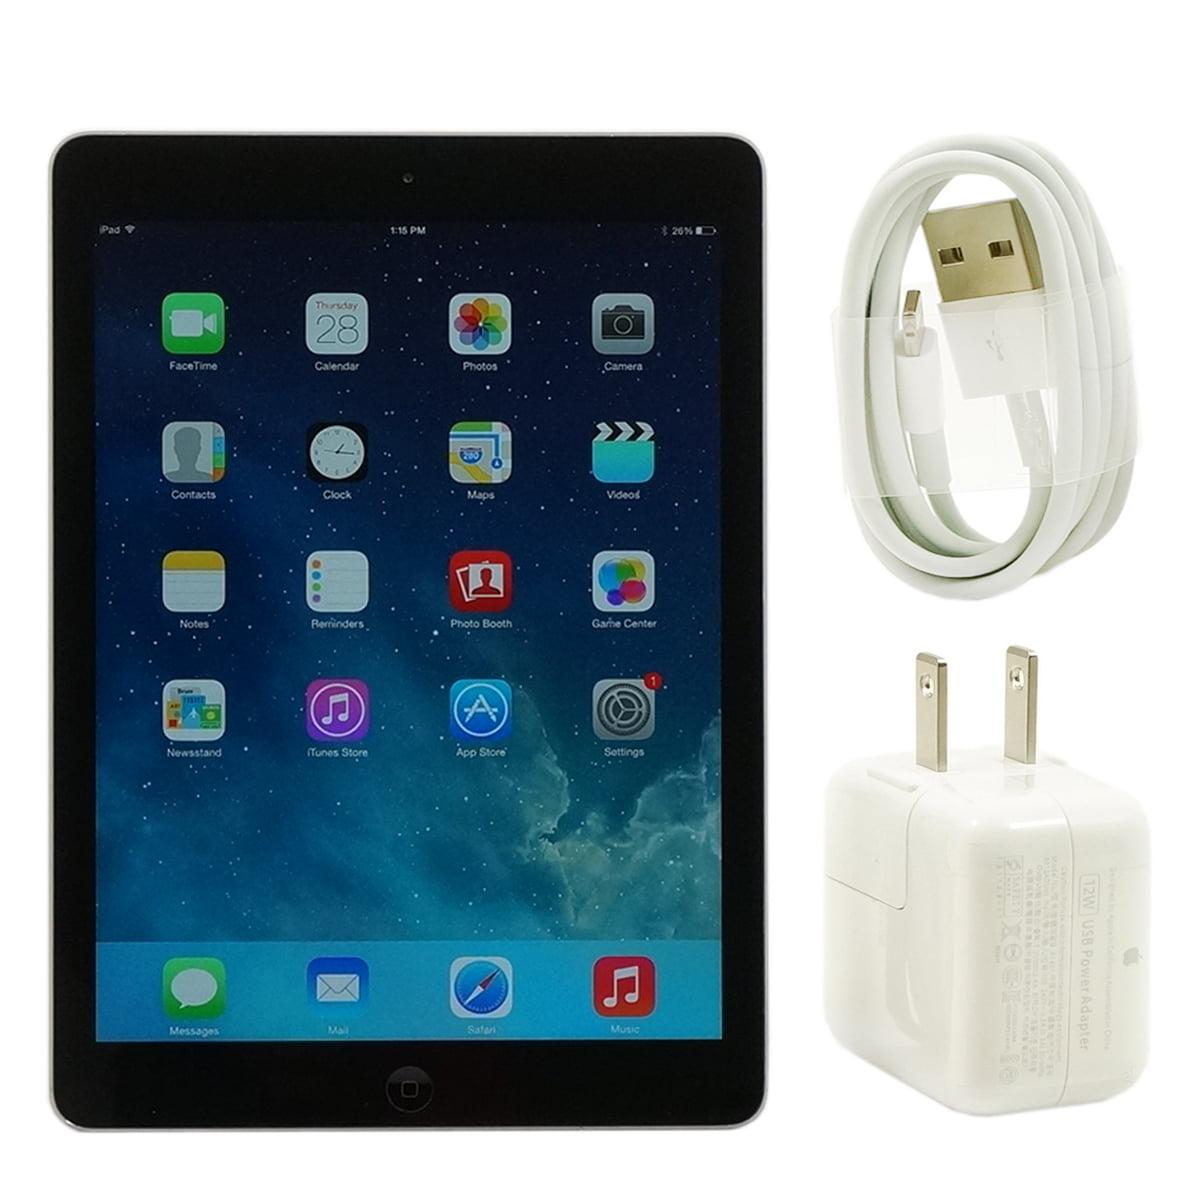 dd9769db4de Apple iPad Air 2 (Refurbished) 16GB Wi-Fi + Cellular - Walmart.com